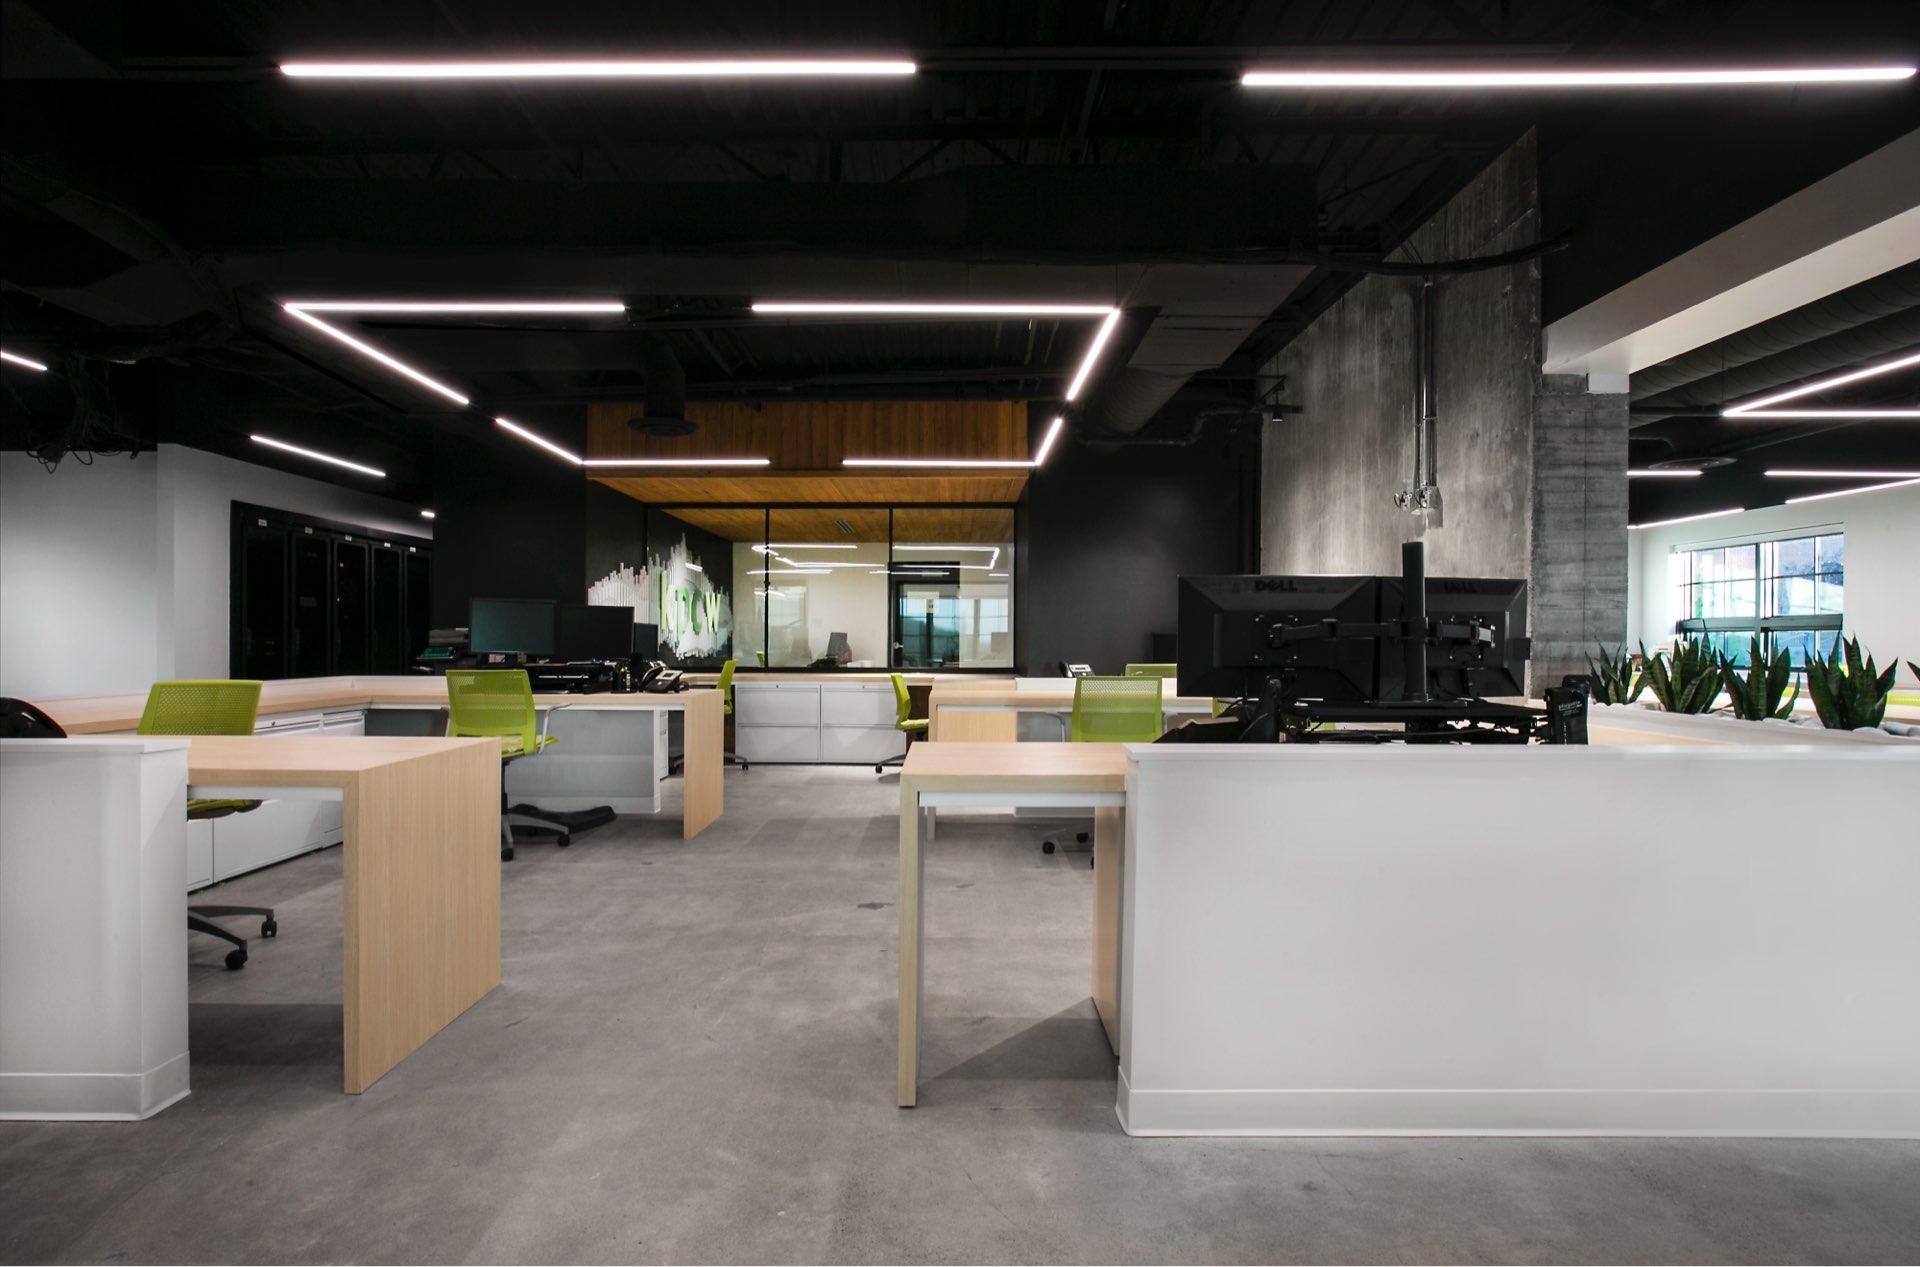 Office area, KPCW Radio, architectural design by Elliott Workgroup